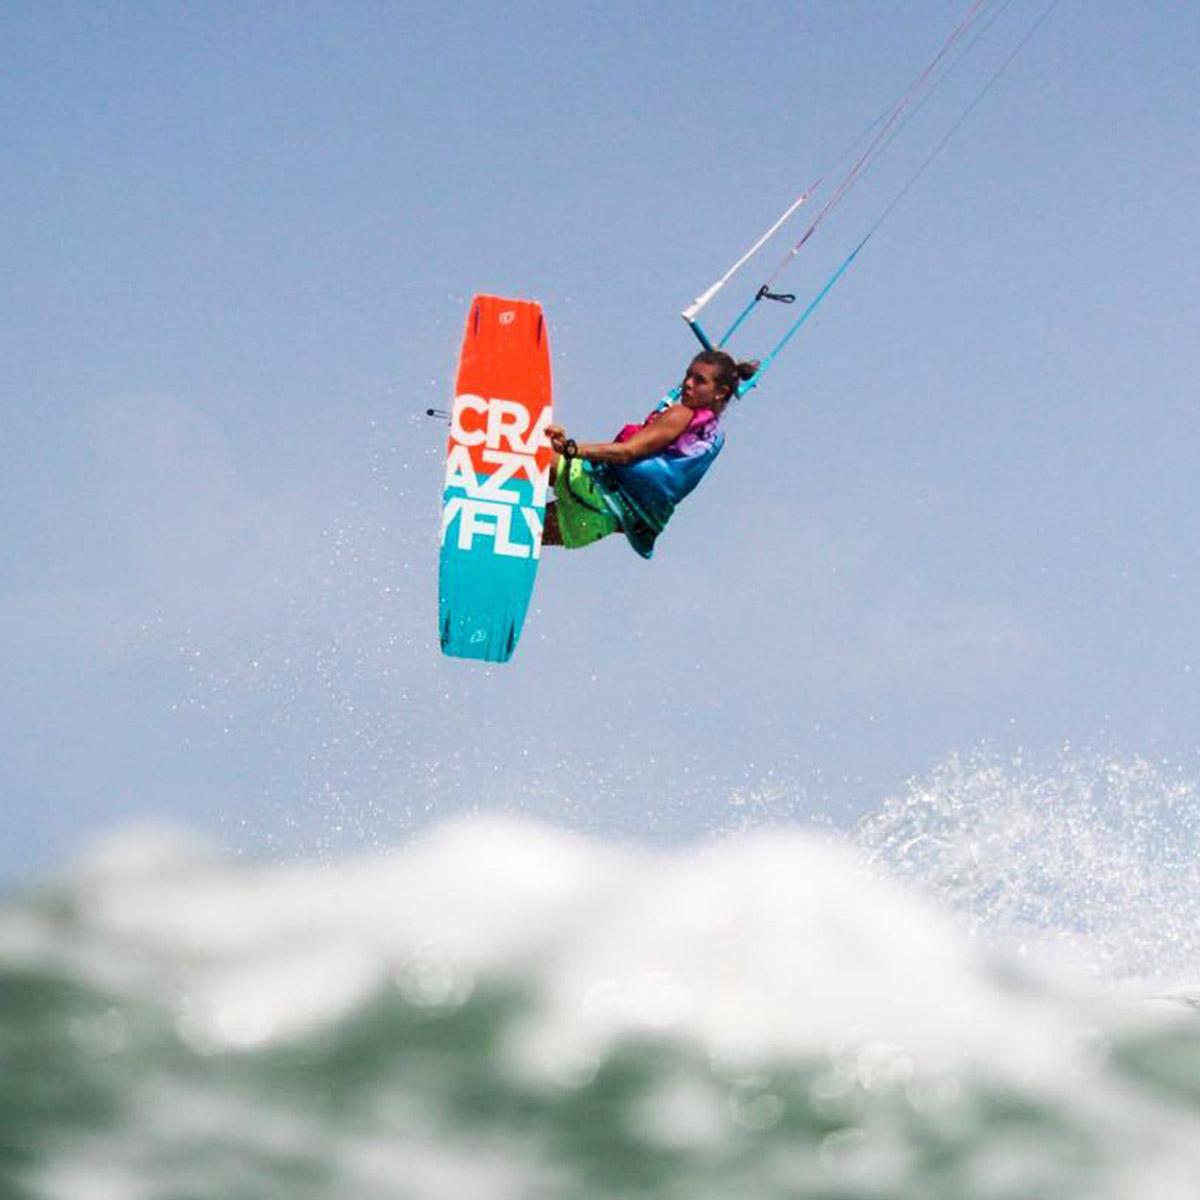 liloo-gringa-weridelocal-malavita-team-rider-kitesurf-4